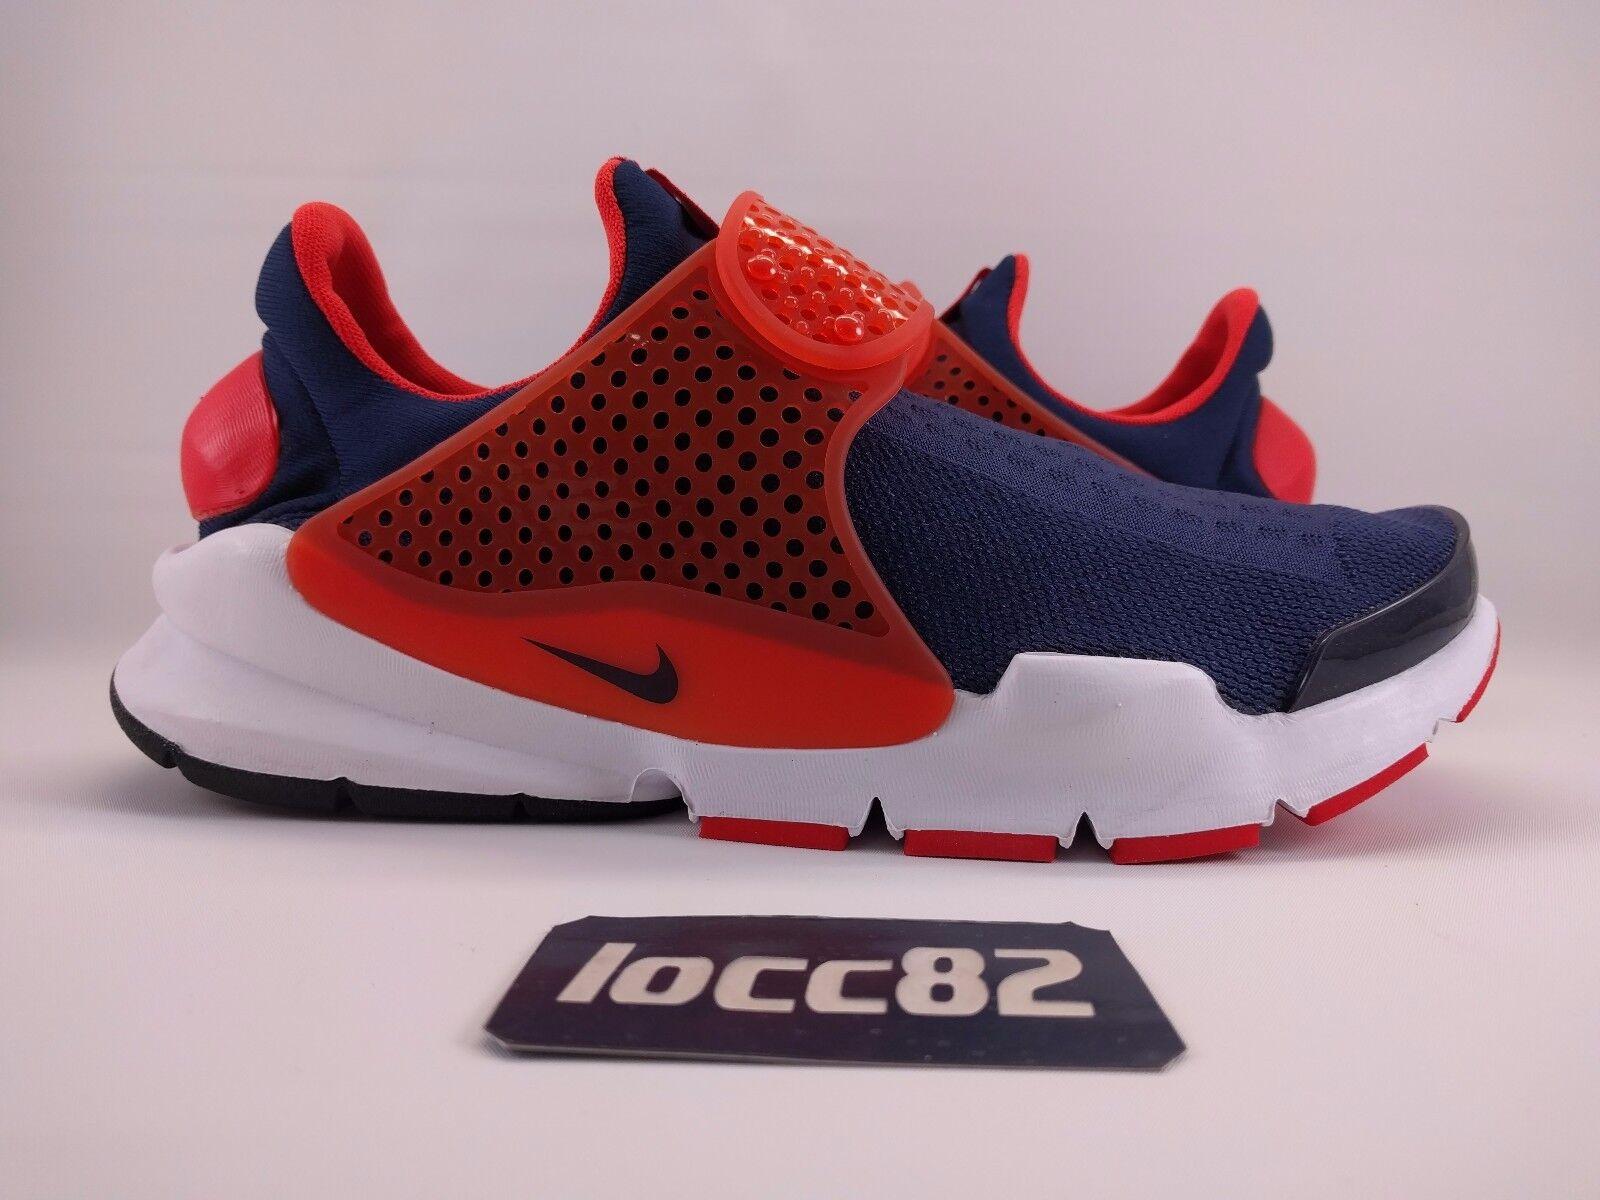 Nike Men's Sock Dart KJCRD Midnight Navy Orange sz 8 (819686-402) racer flyknit